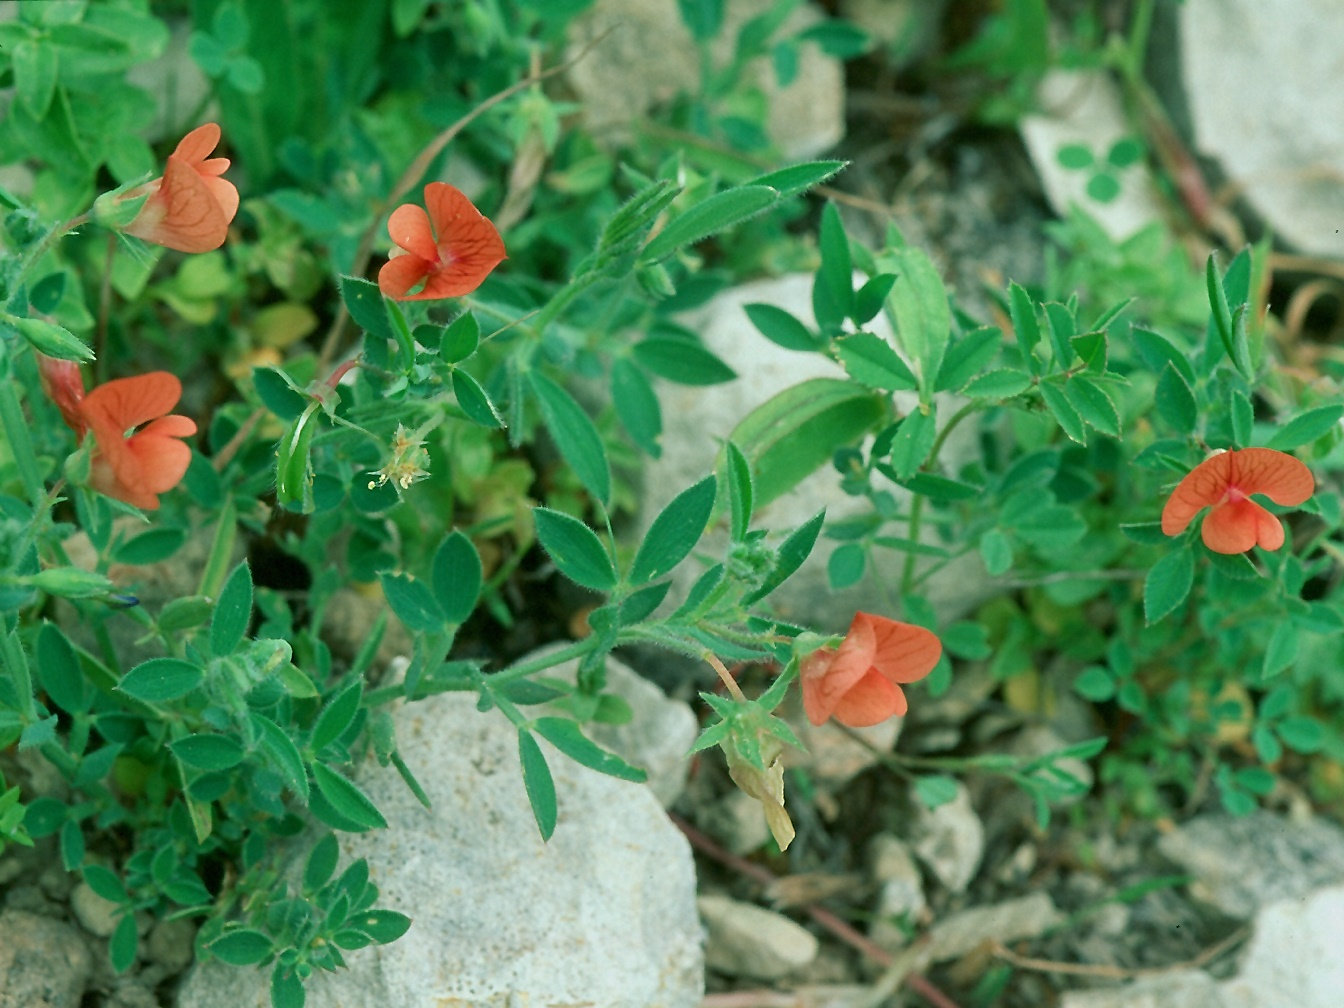 Lathyrus blepharicarpus